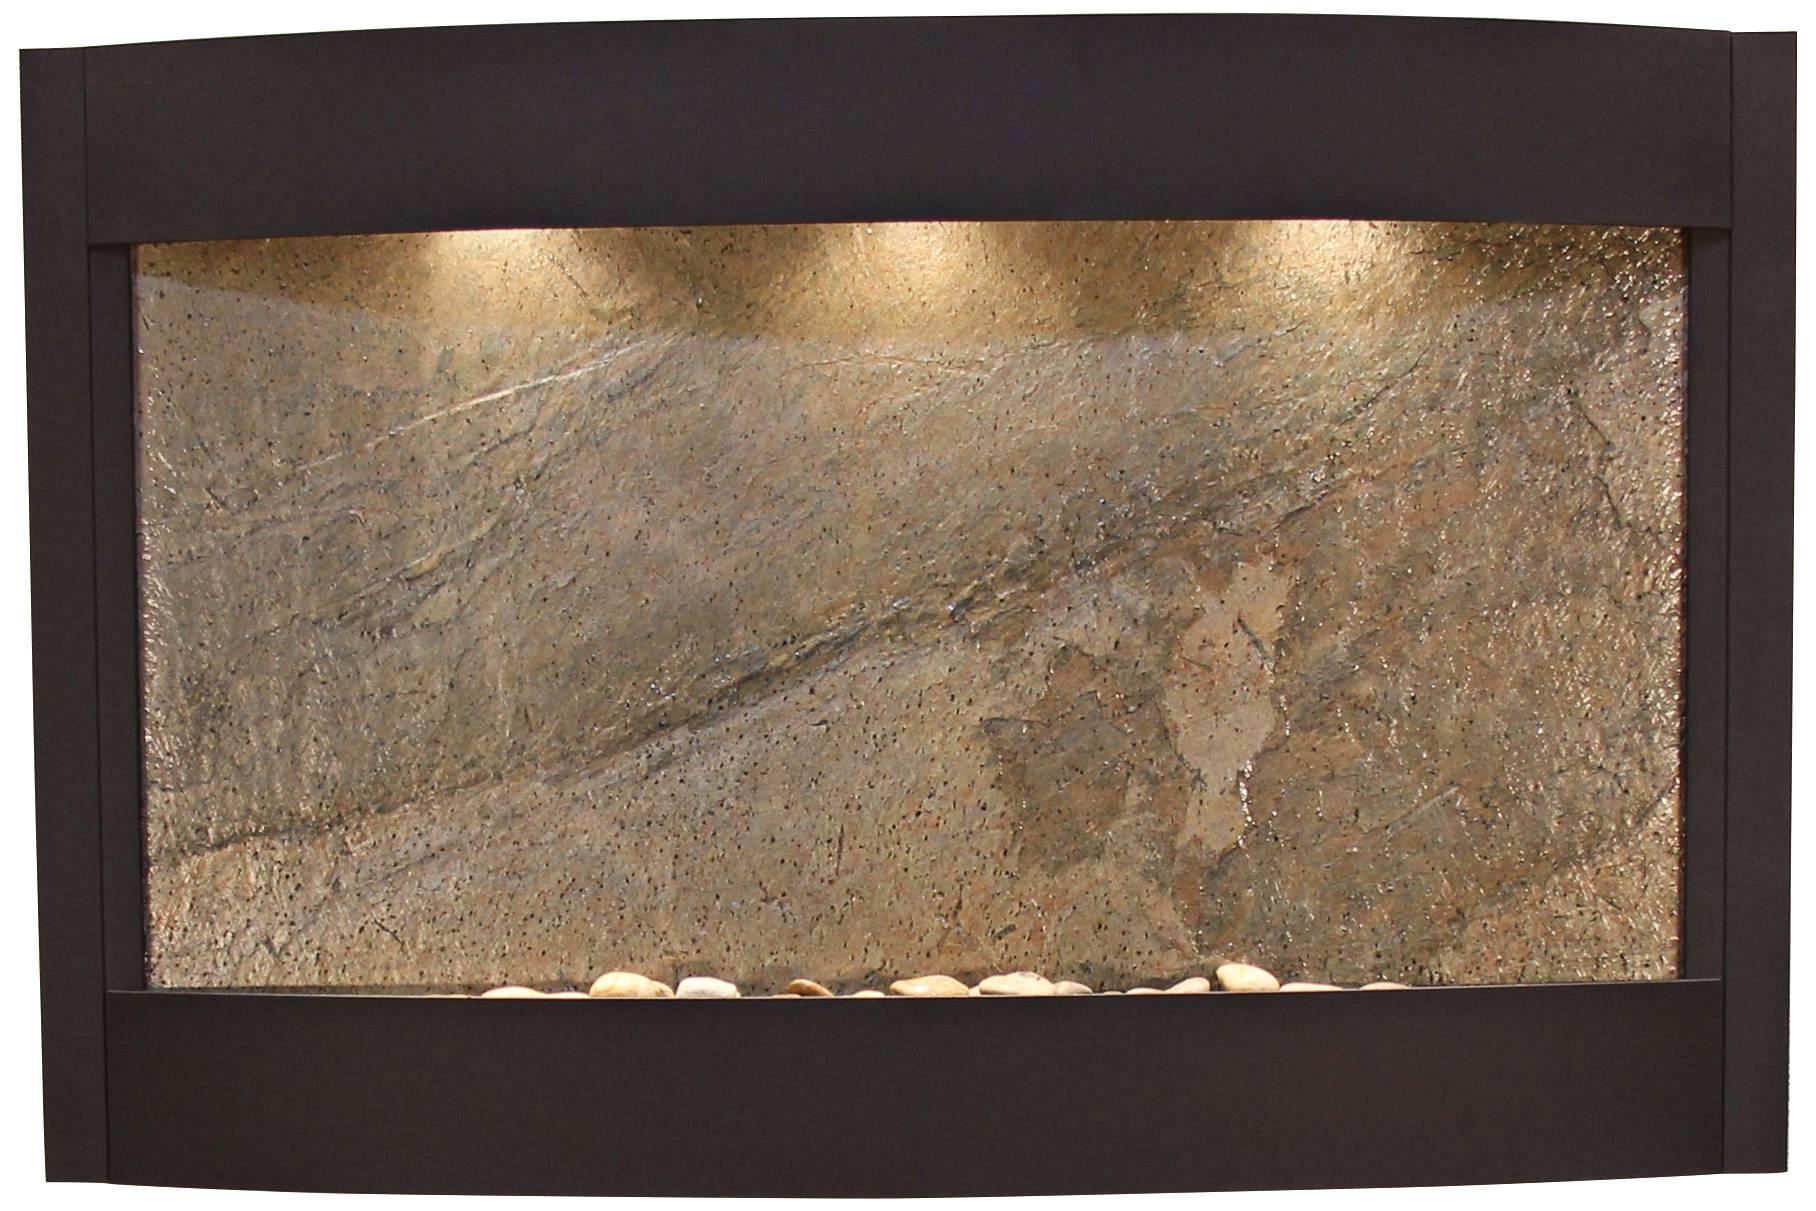 cottonwood falls black singles Cottonwood falls black stone round copper 69h wall fountain $ 299900 free shipping more like this cottonwood falls green stone round copper 69h wall fountain $ 299900 free shipping.